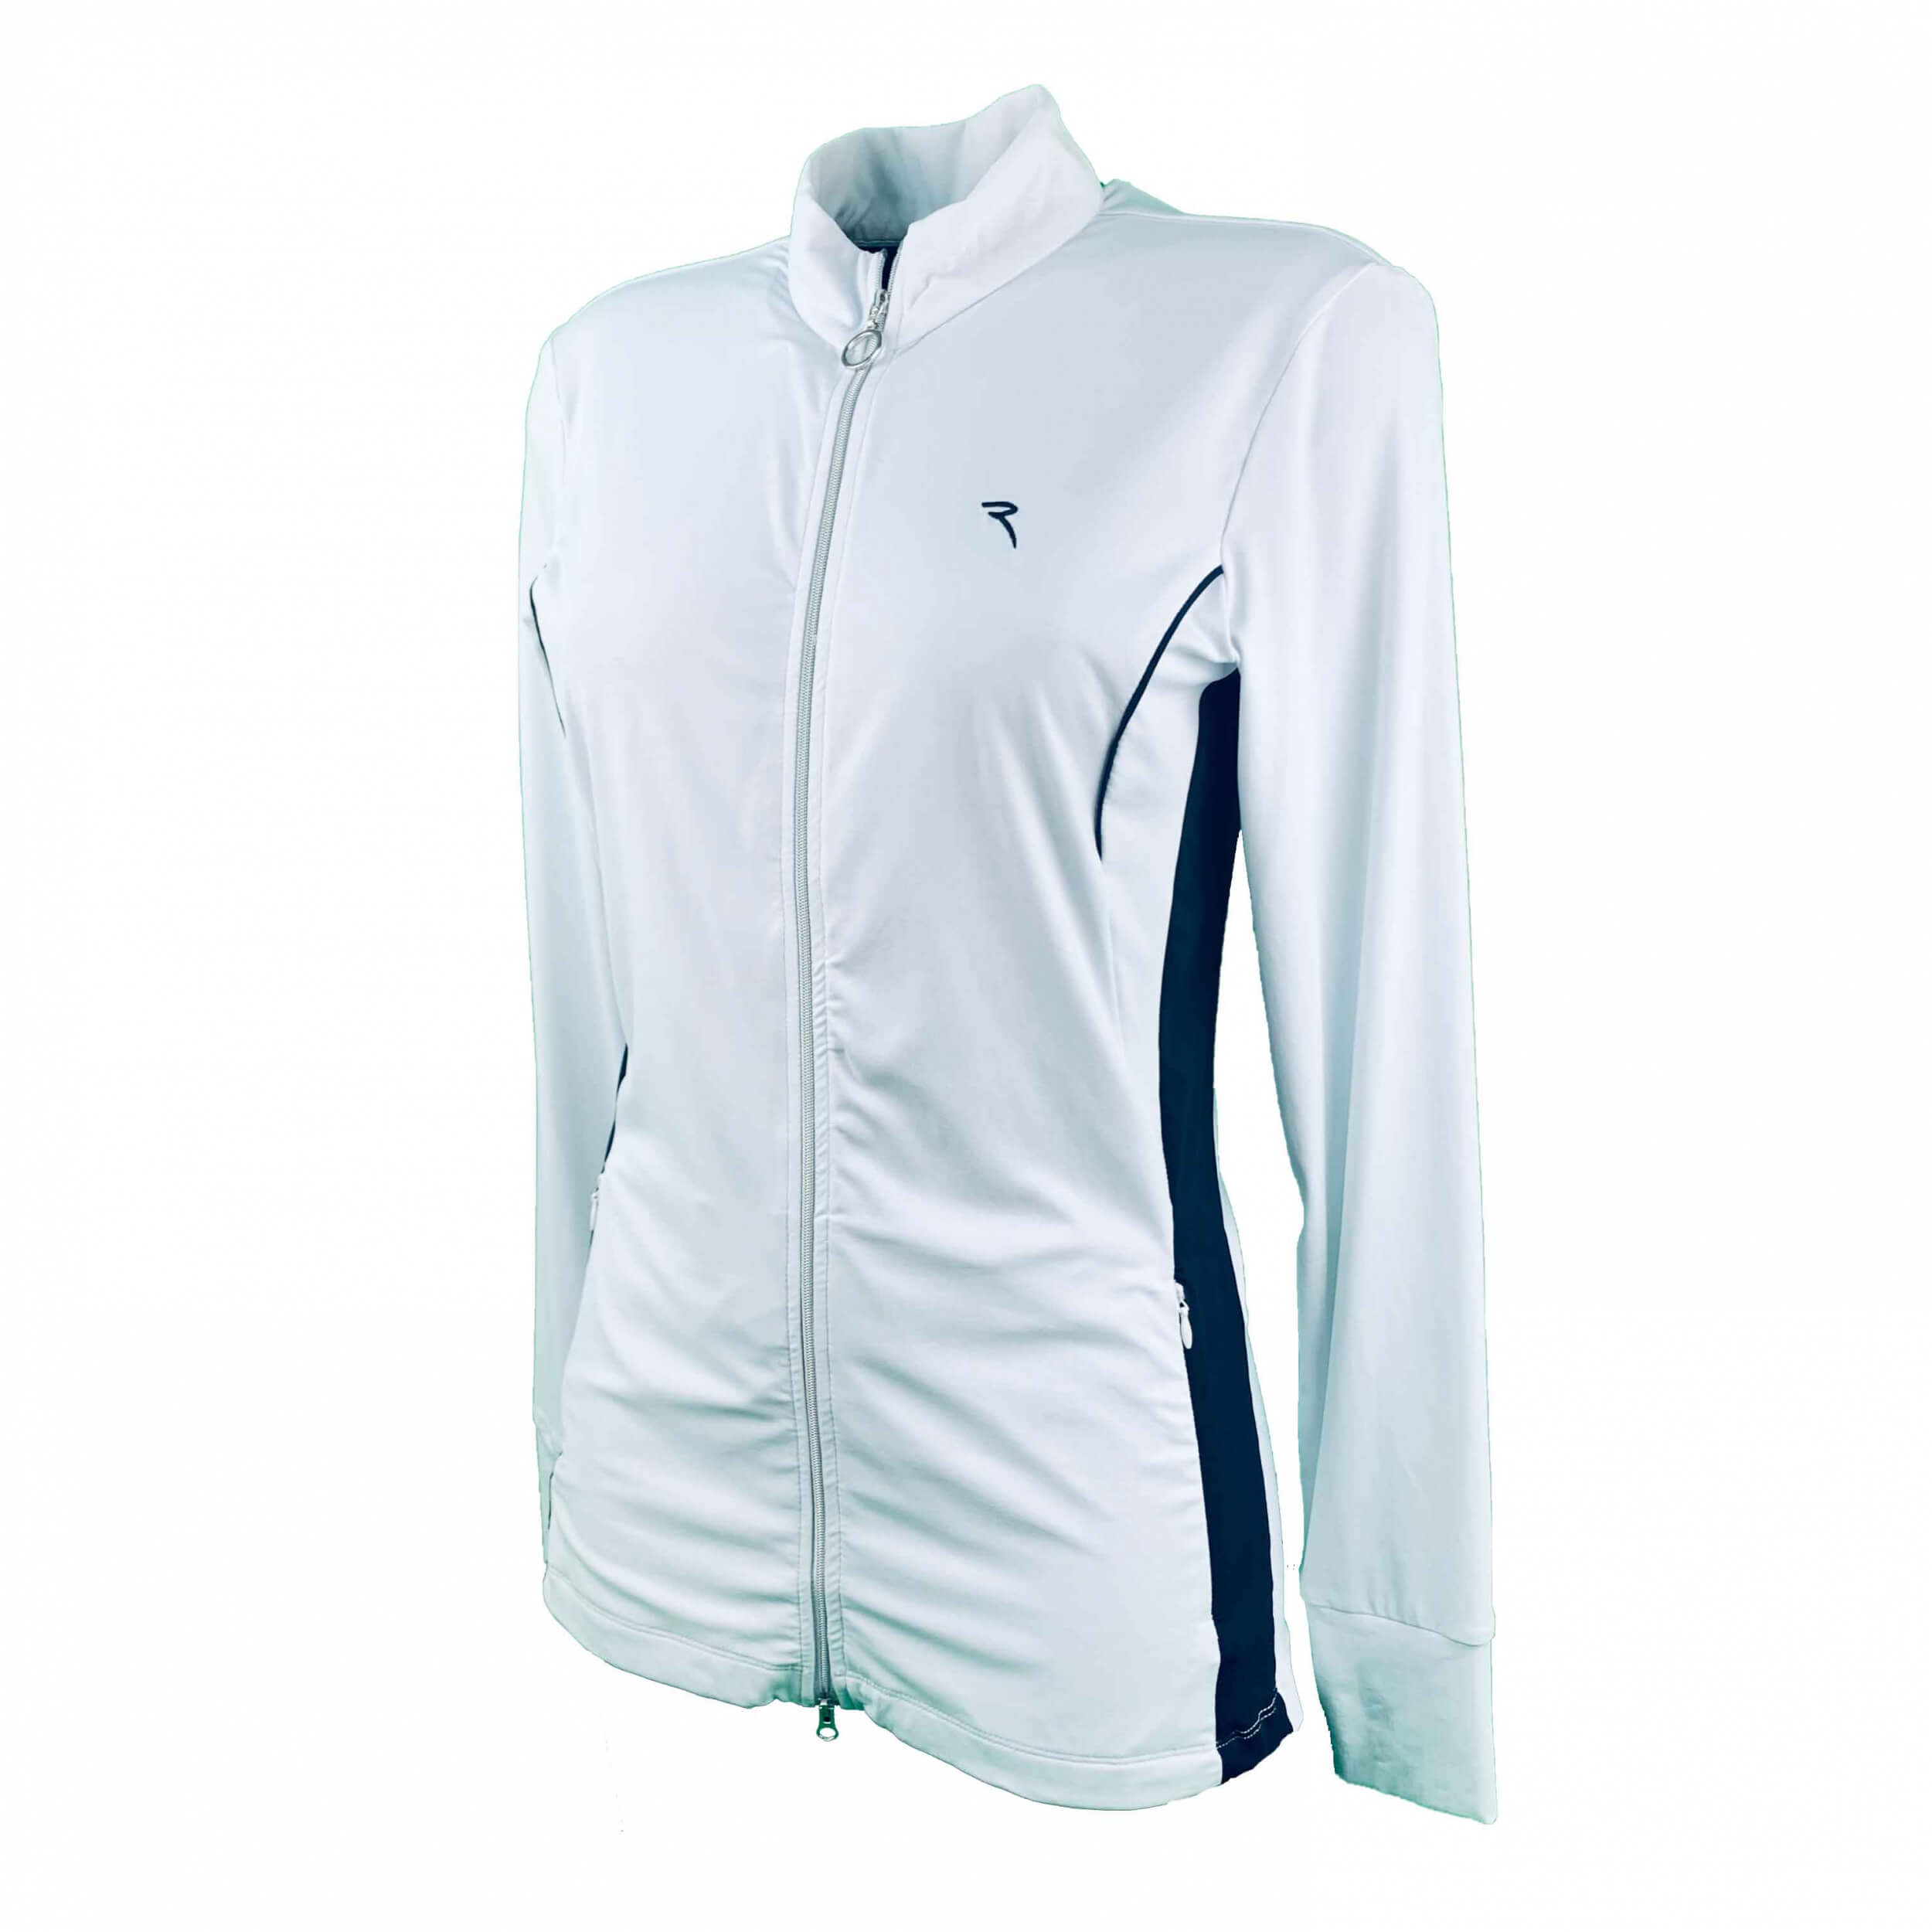 Chervo Damen Sweatshirt Jacke Passel Sun Block weiß 2.Wahl